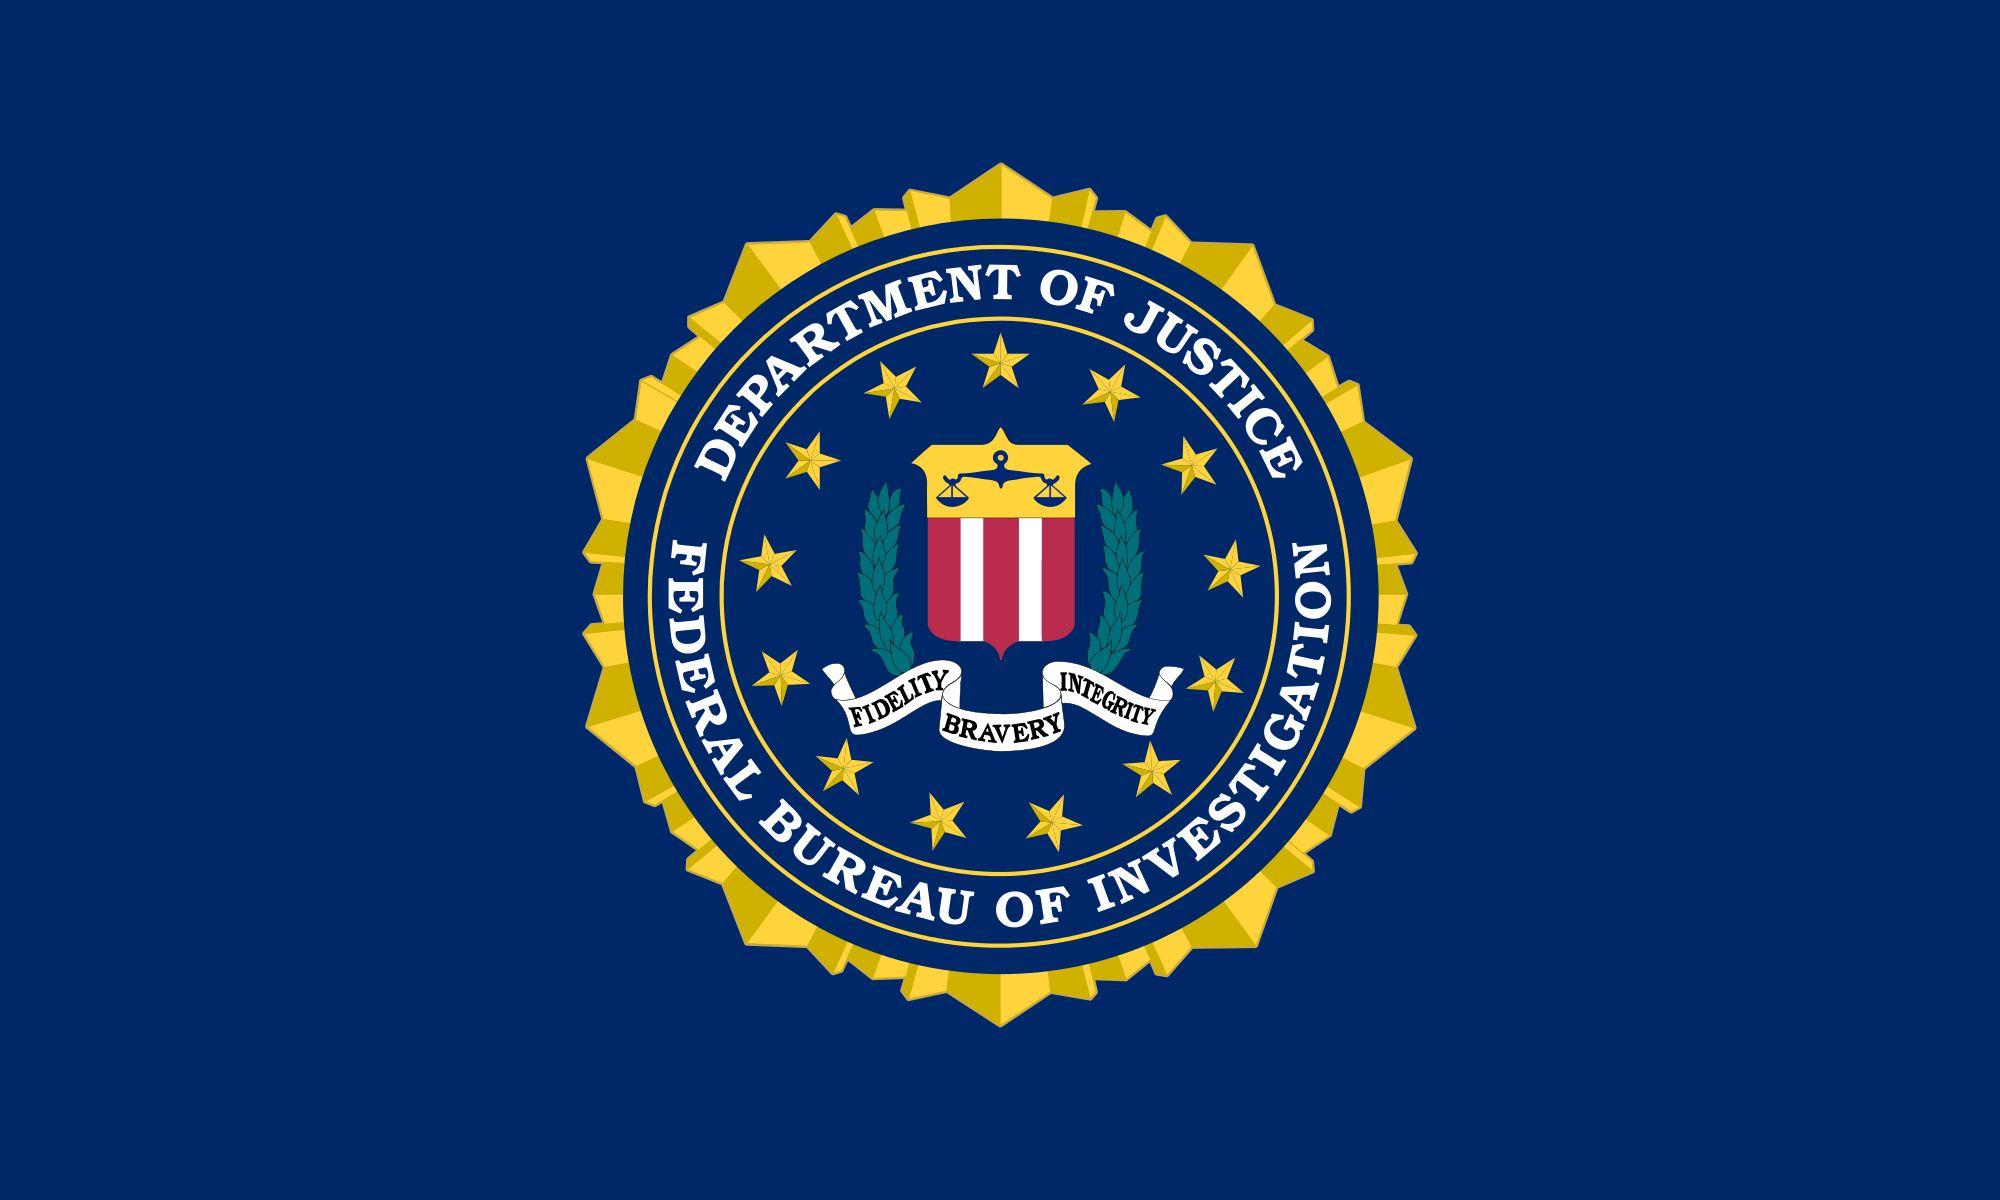 FBI在某技术园区突击搜查未经授权的加密货币交易